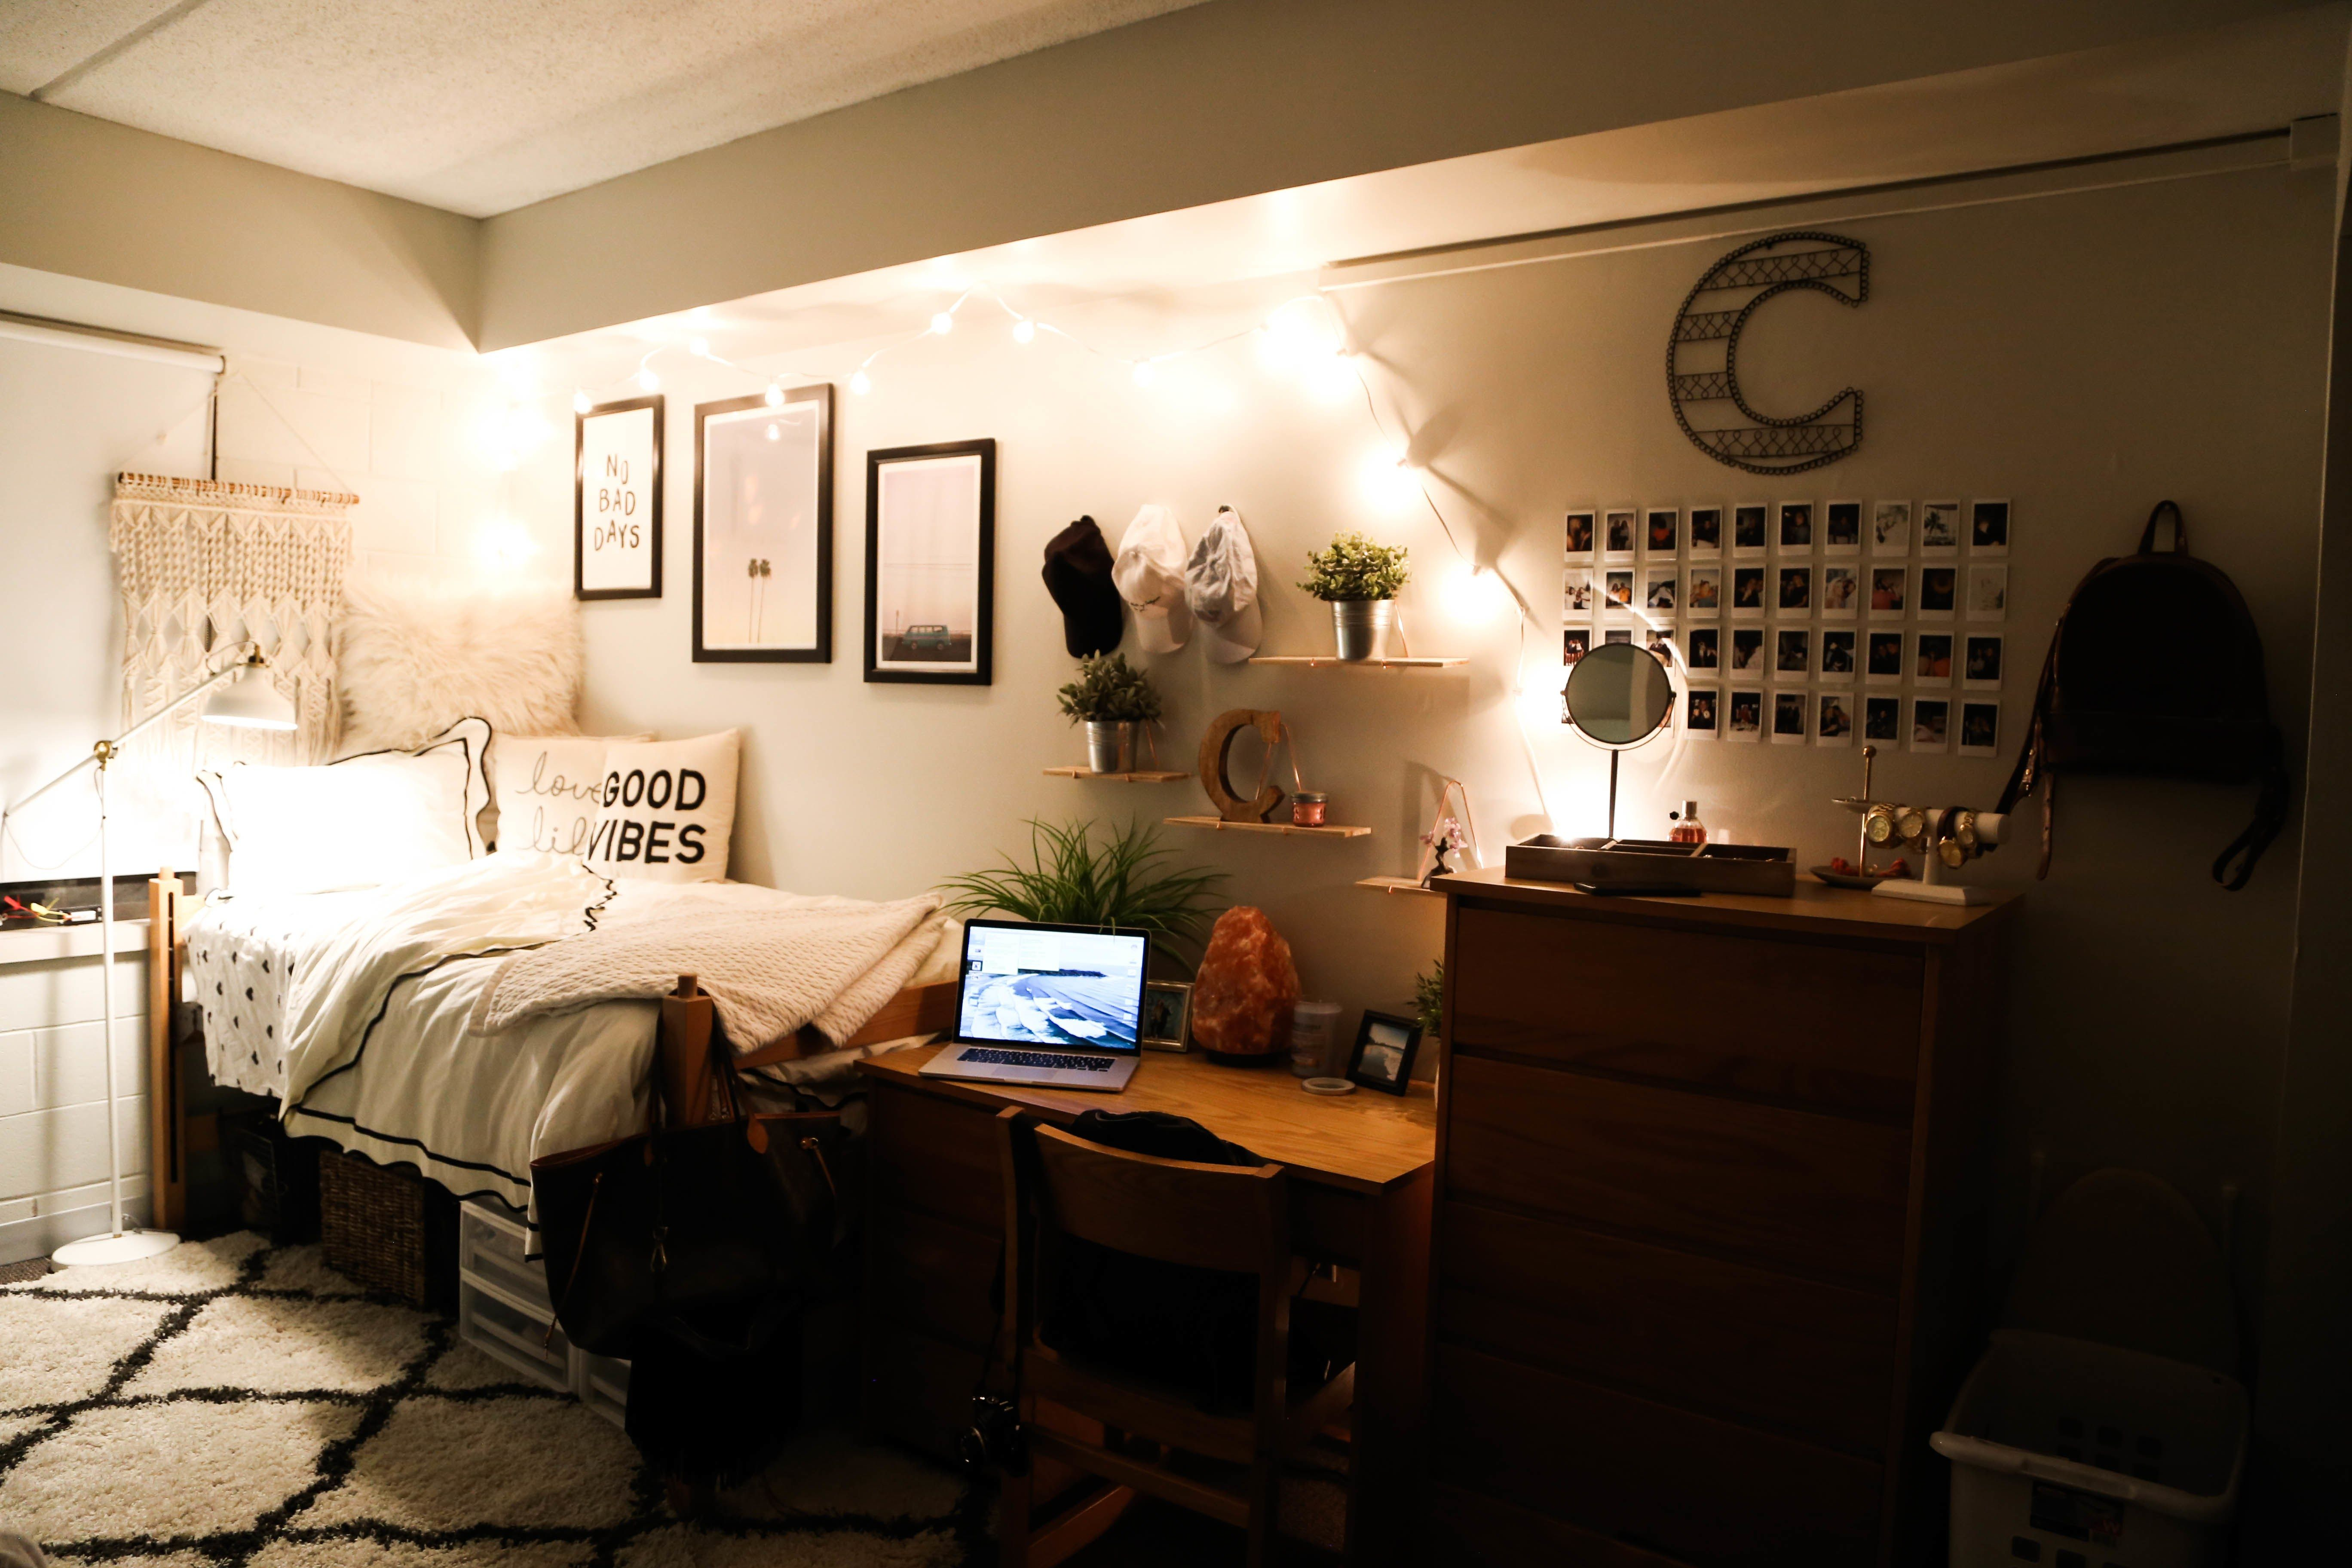 Dorm Decor at Boston College images